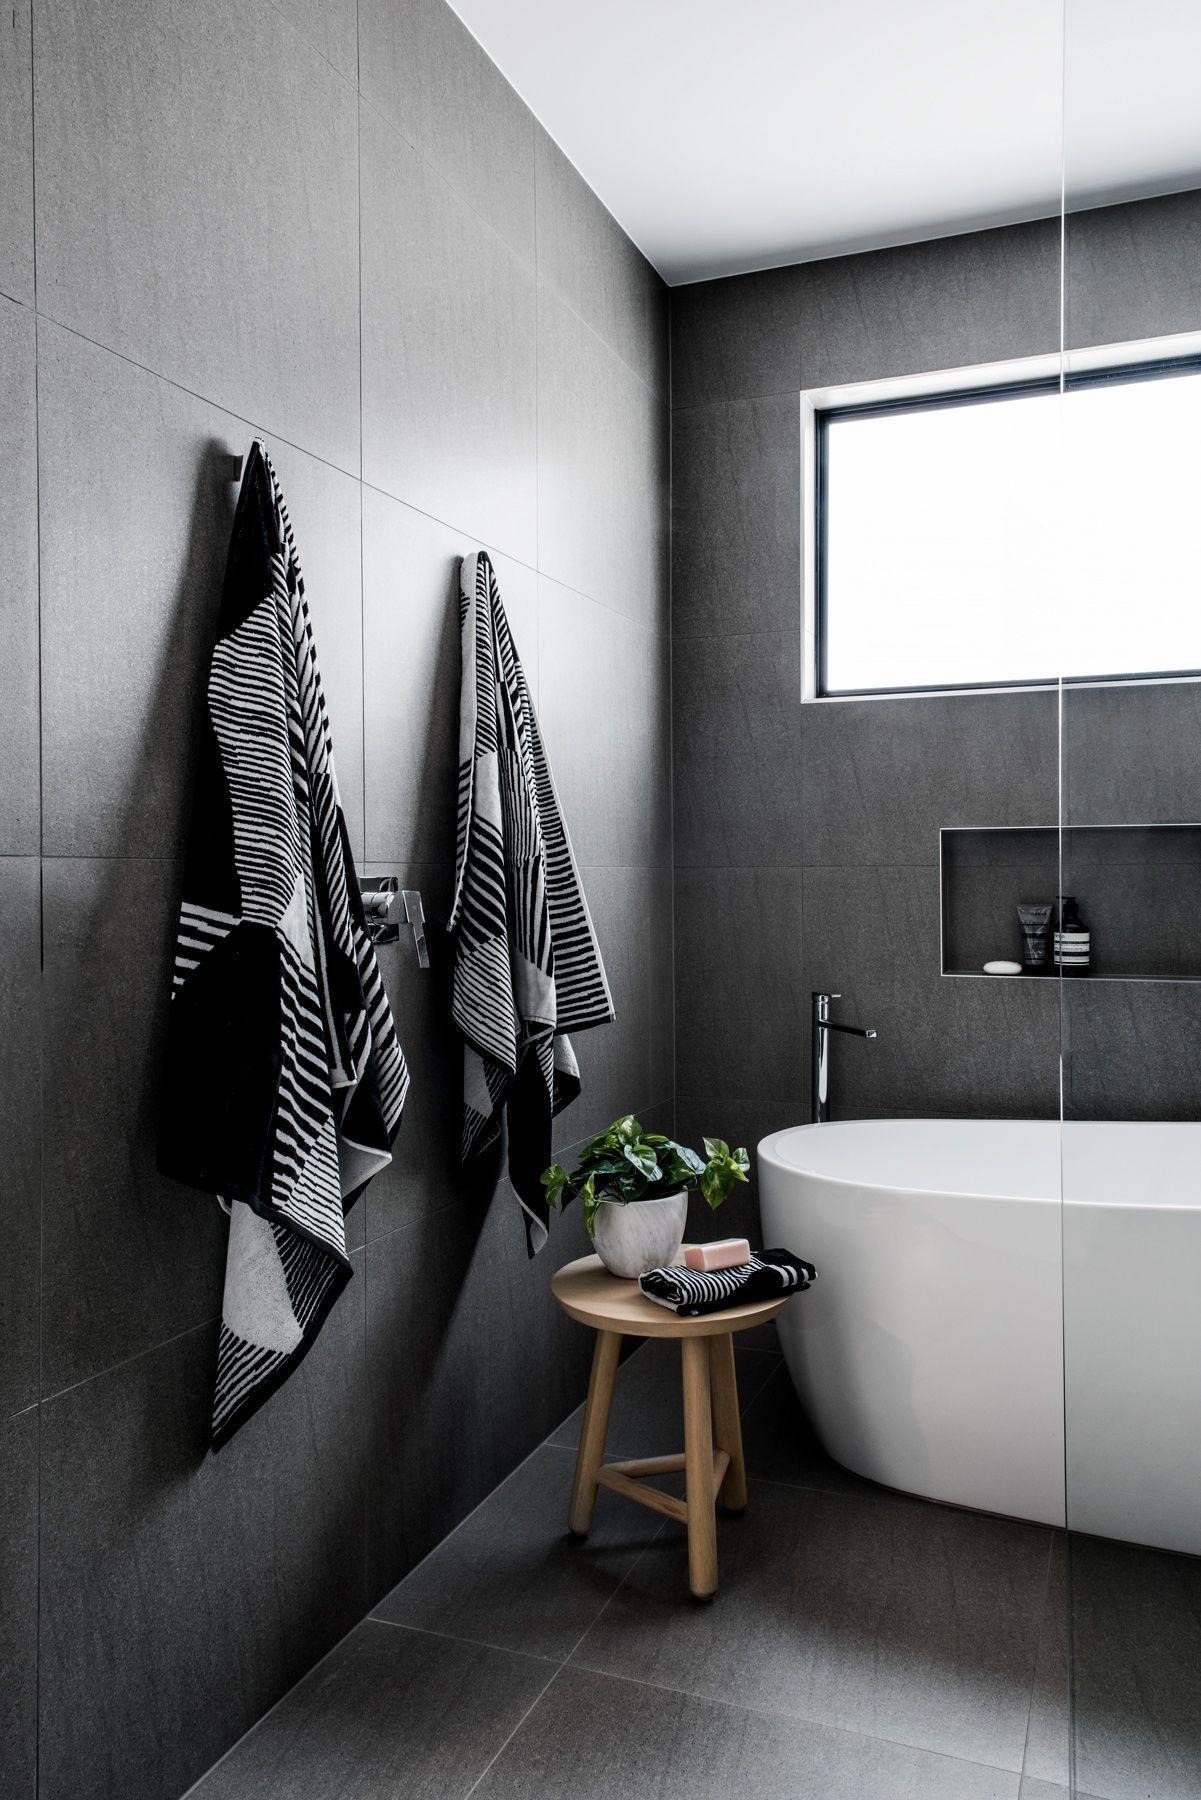 Kalka Rochedale Display Home Bathroom Bath Towel Minimalist Bathroom Design Bathroom Interior Design Minimalist Bathroom